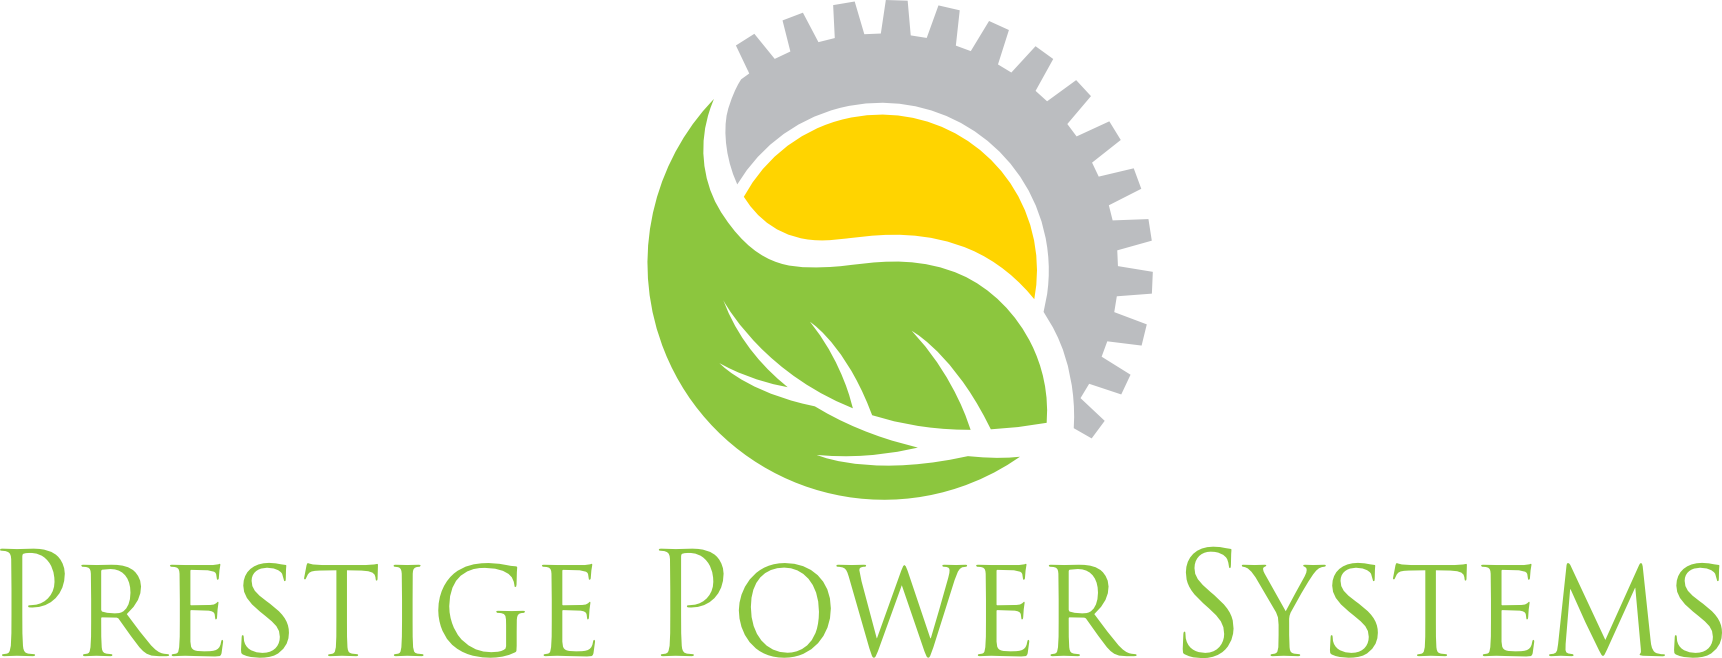 Prestige Power Systems